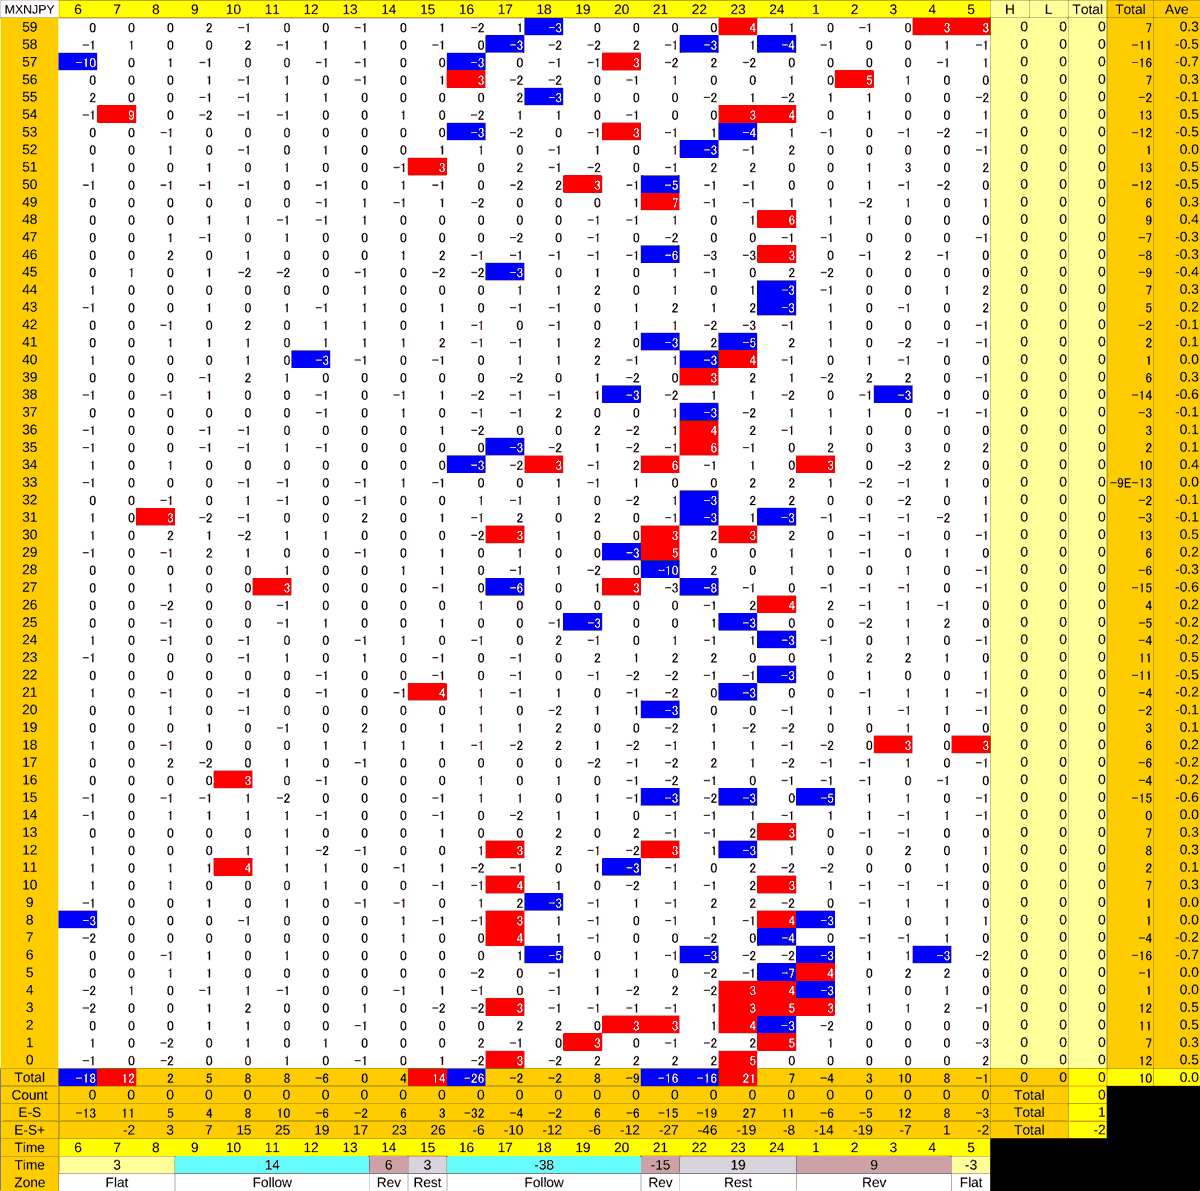 20210105_HS(3)MXNJPY